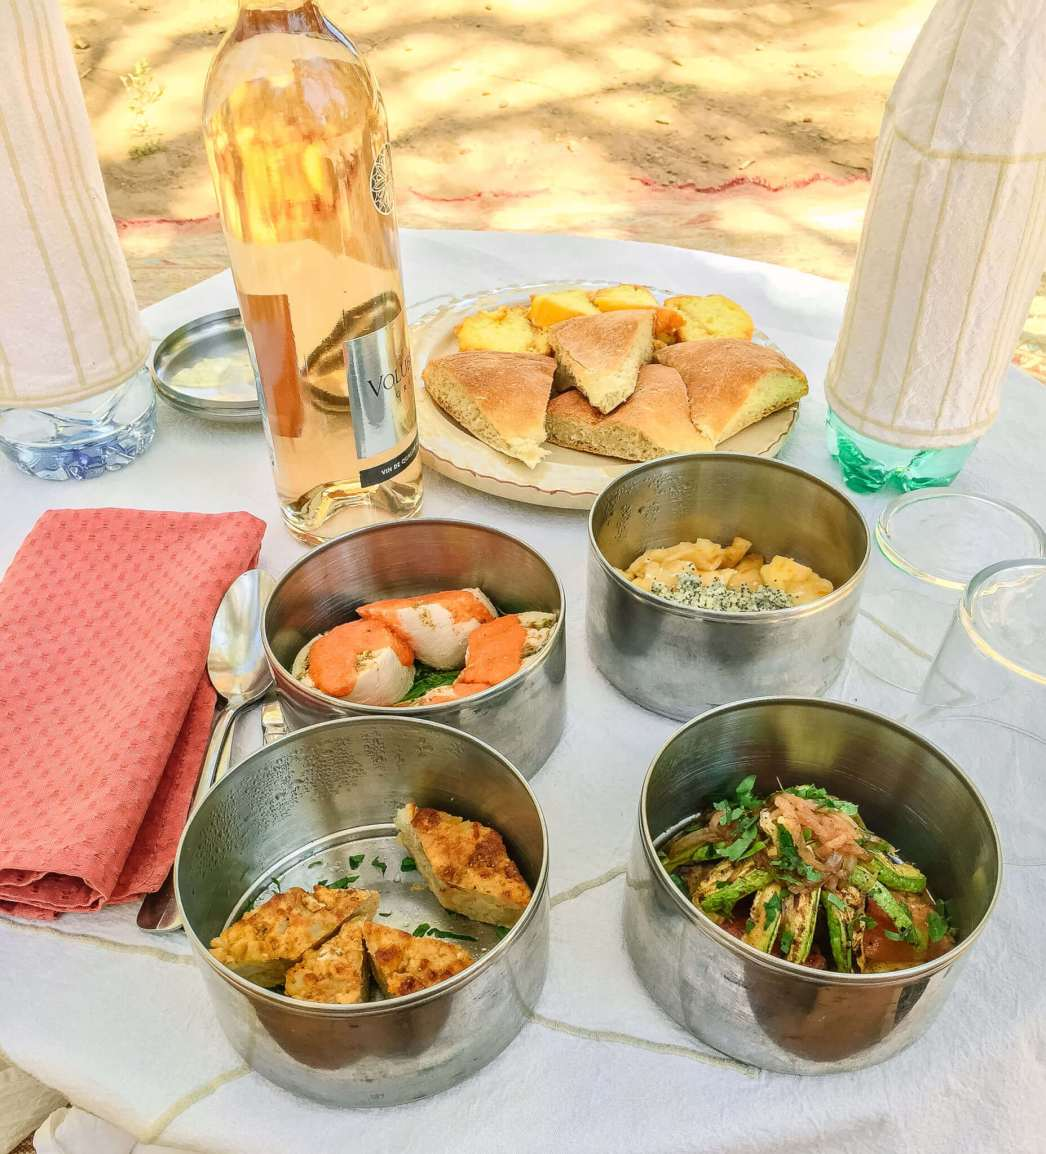 Dar Ahlam picnic lunch